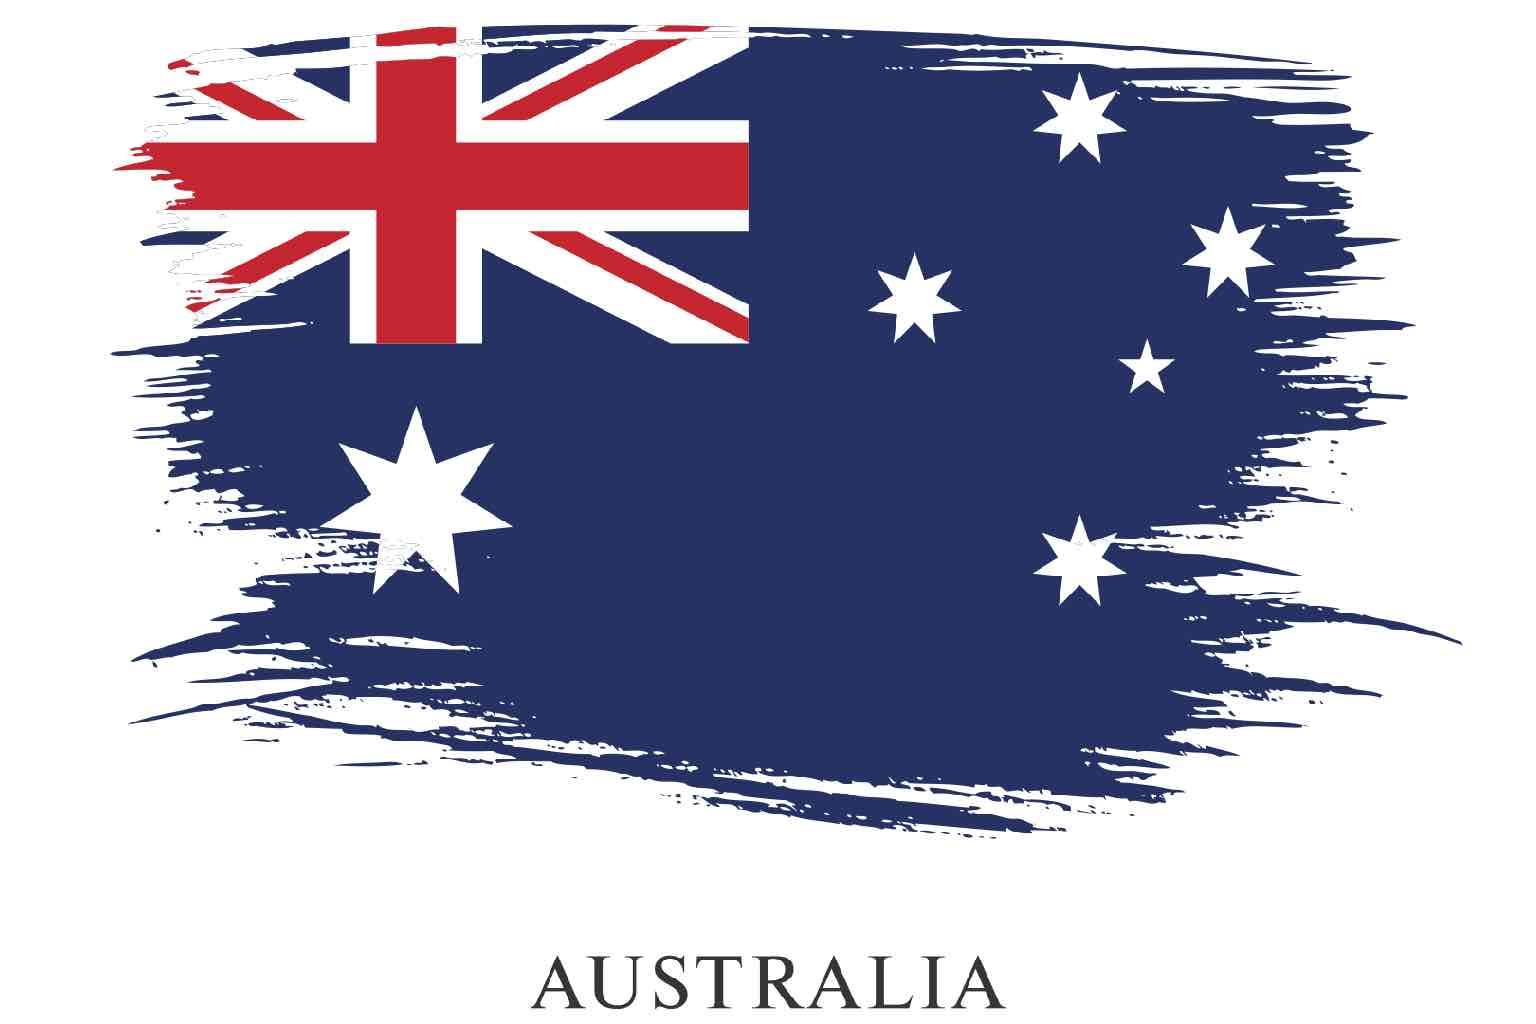 Artistically stressed Australian flag